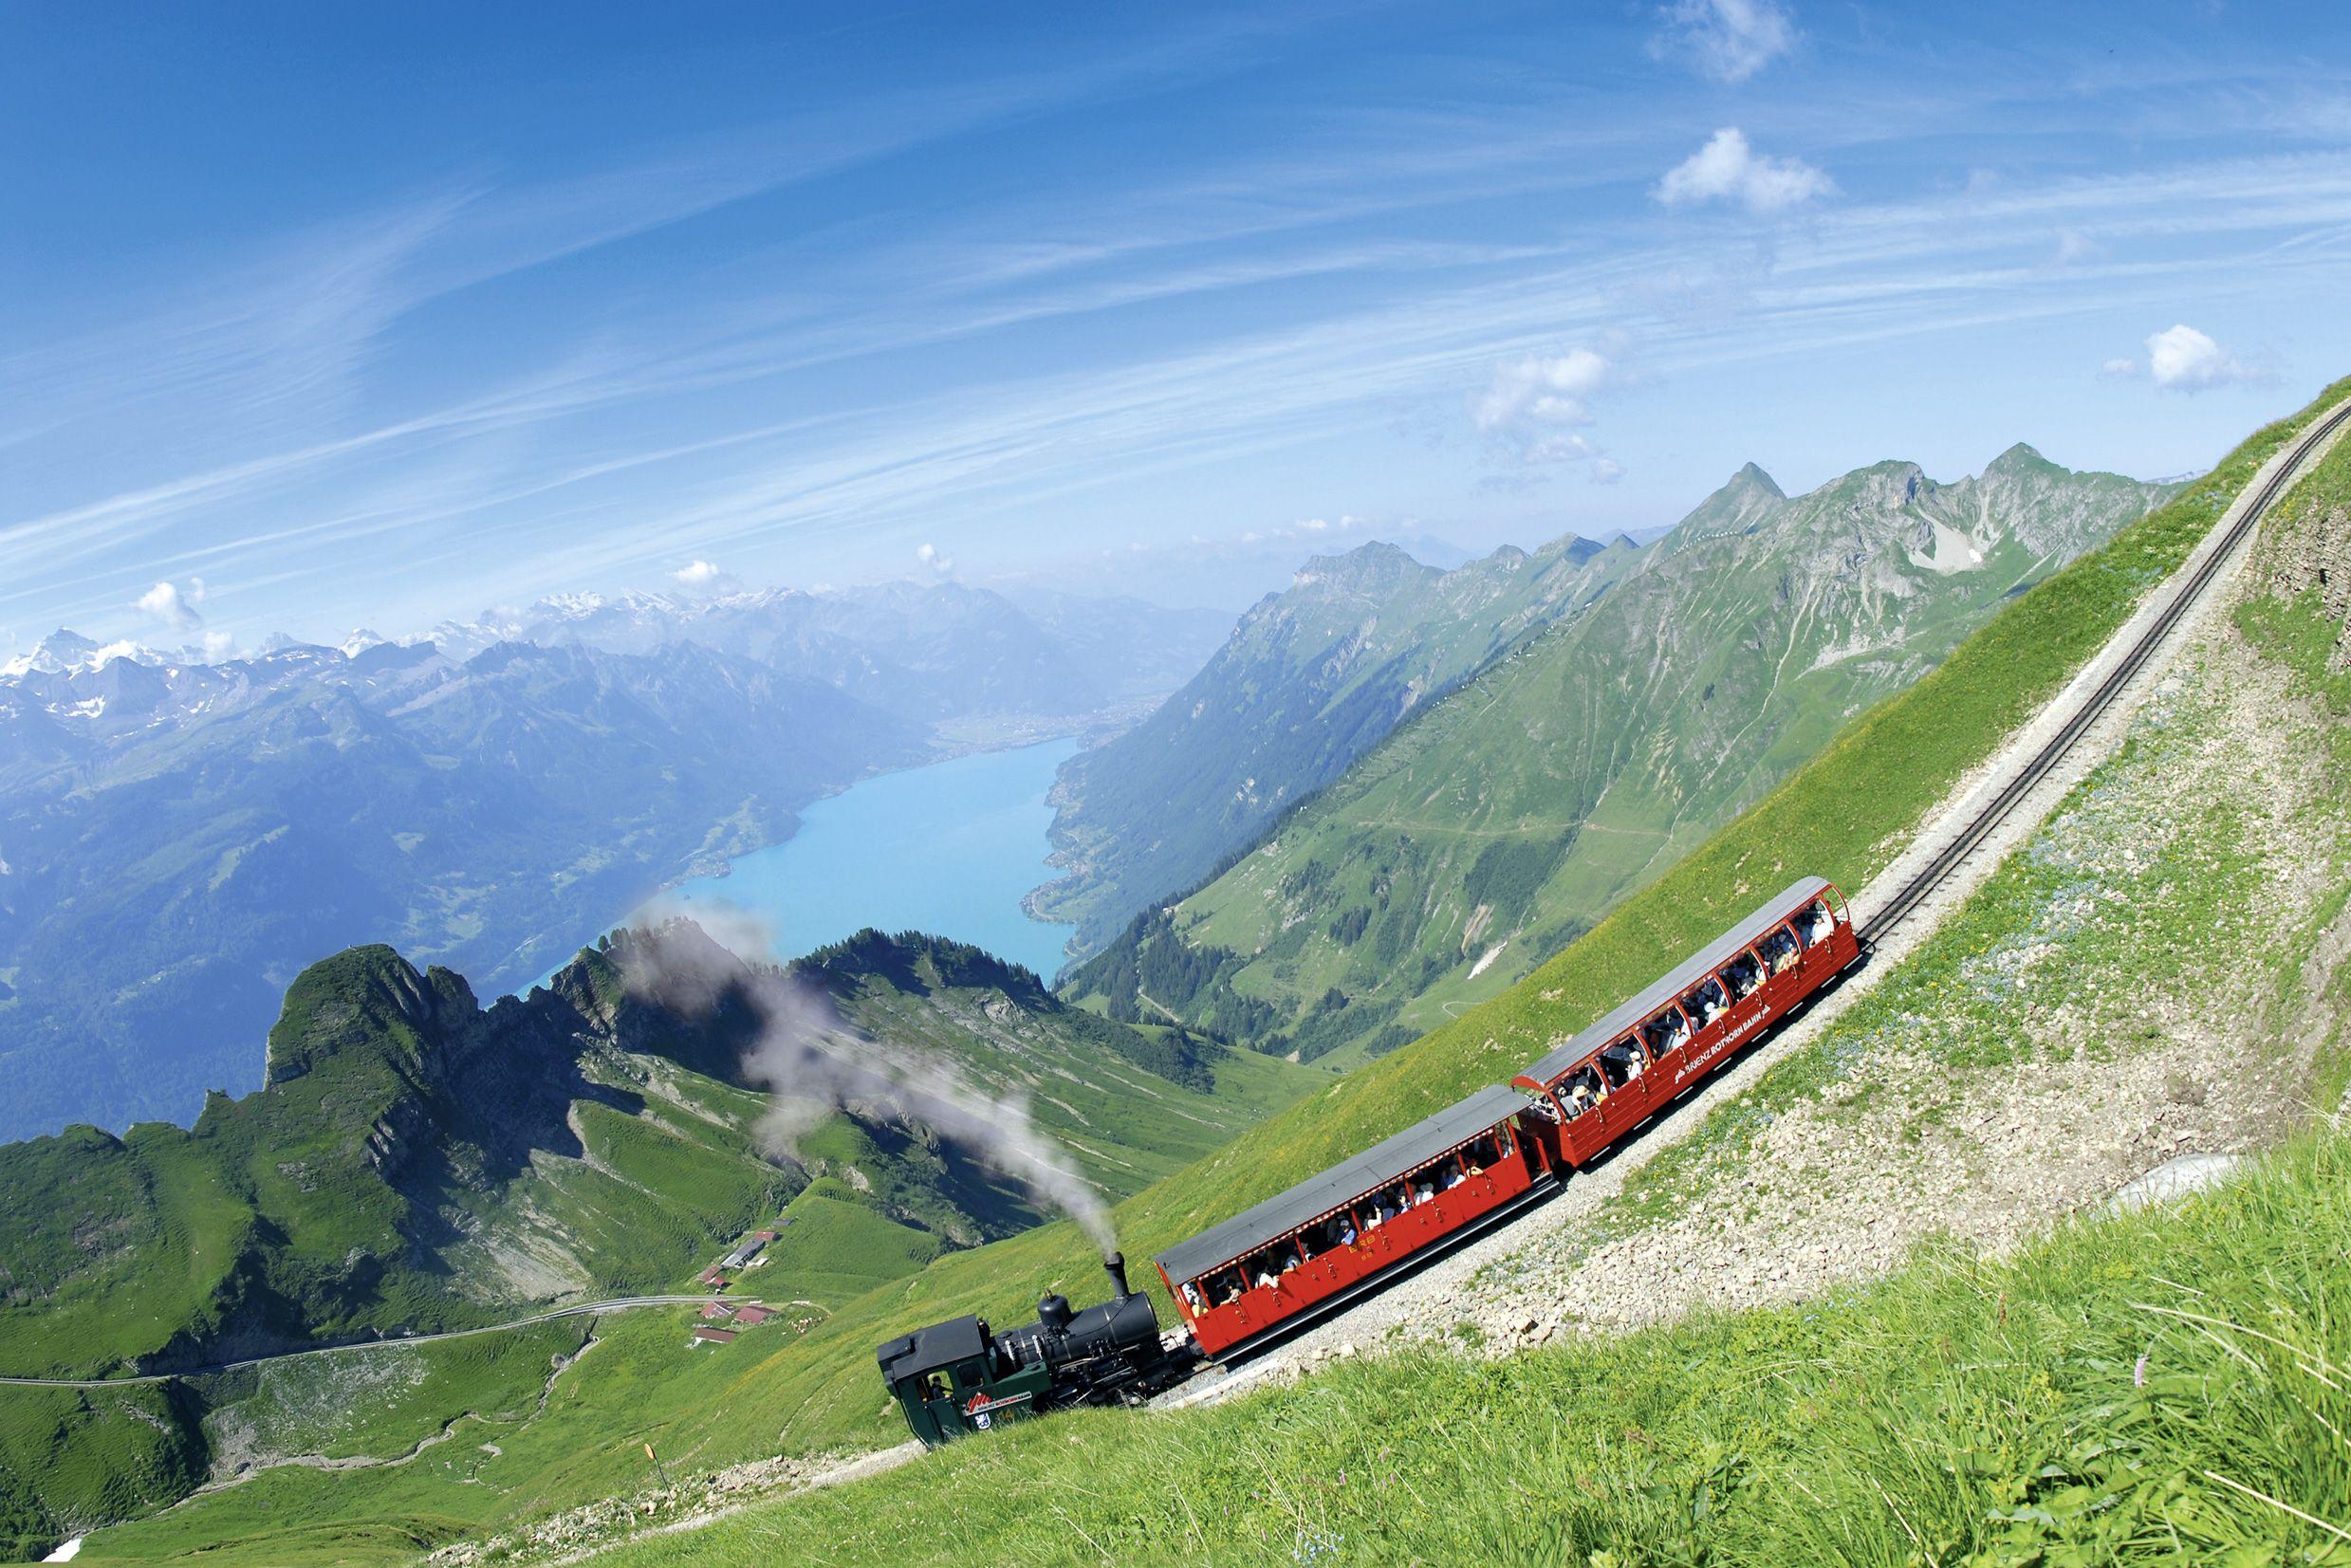 Panoramic Switzerland: Sights and Insights • Leisure Group Travel |  Switzerland tourism, Brienz, Vacation trips